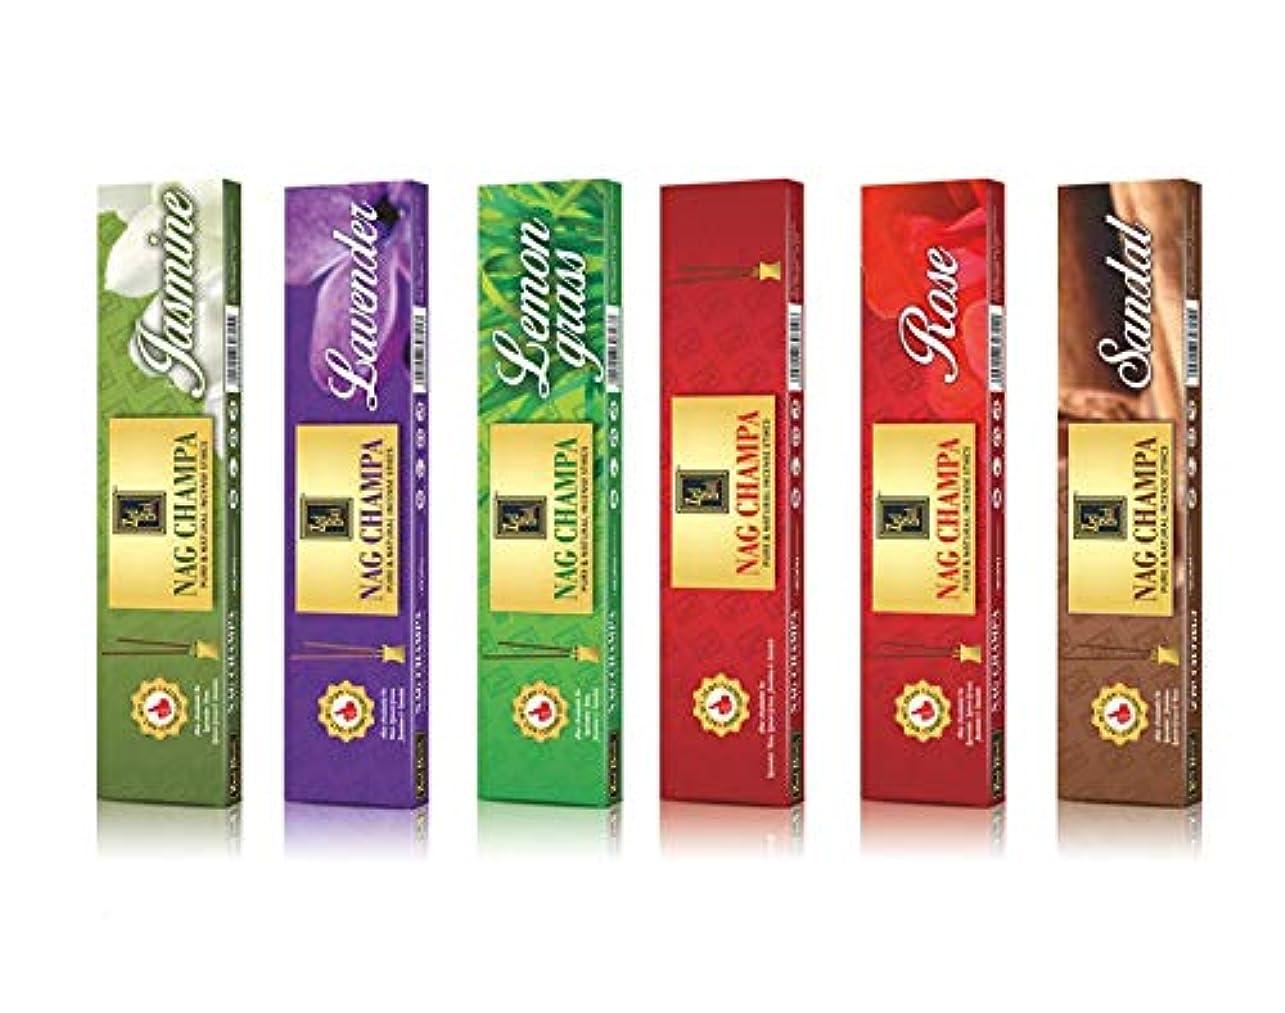 Nagchampaプレミアム天然香料Sticks – 6のパック(10 Sticks perボックス)